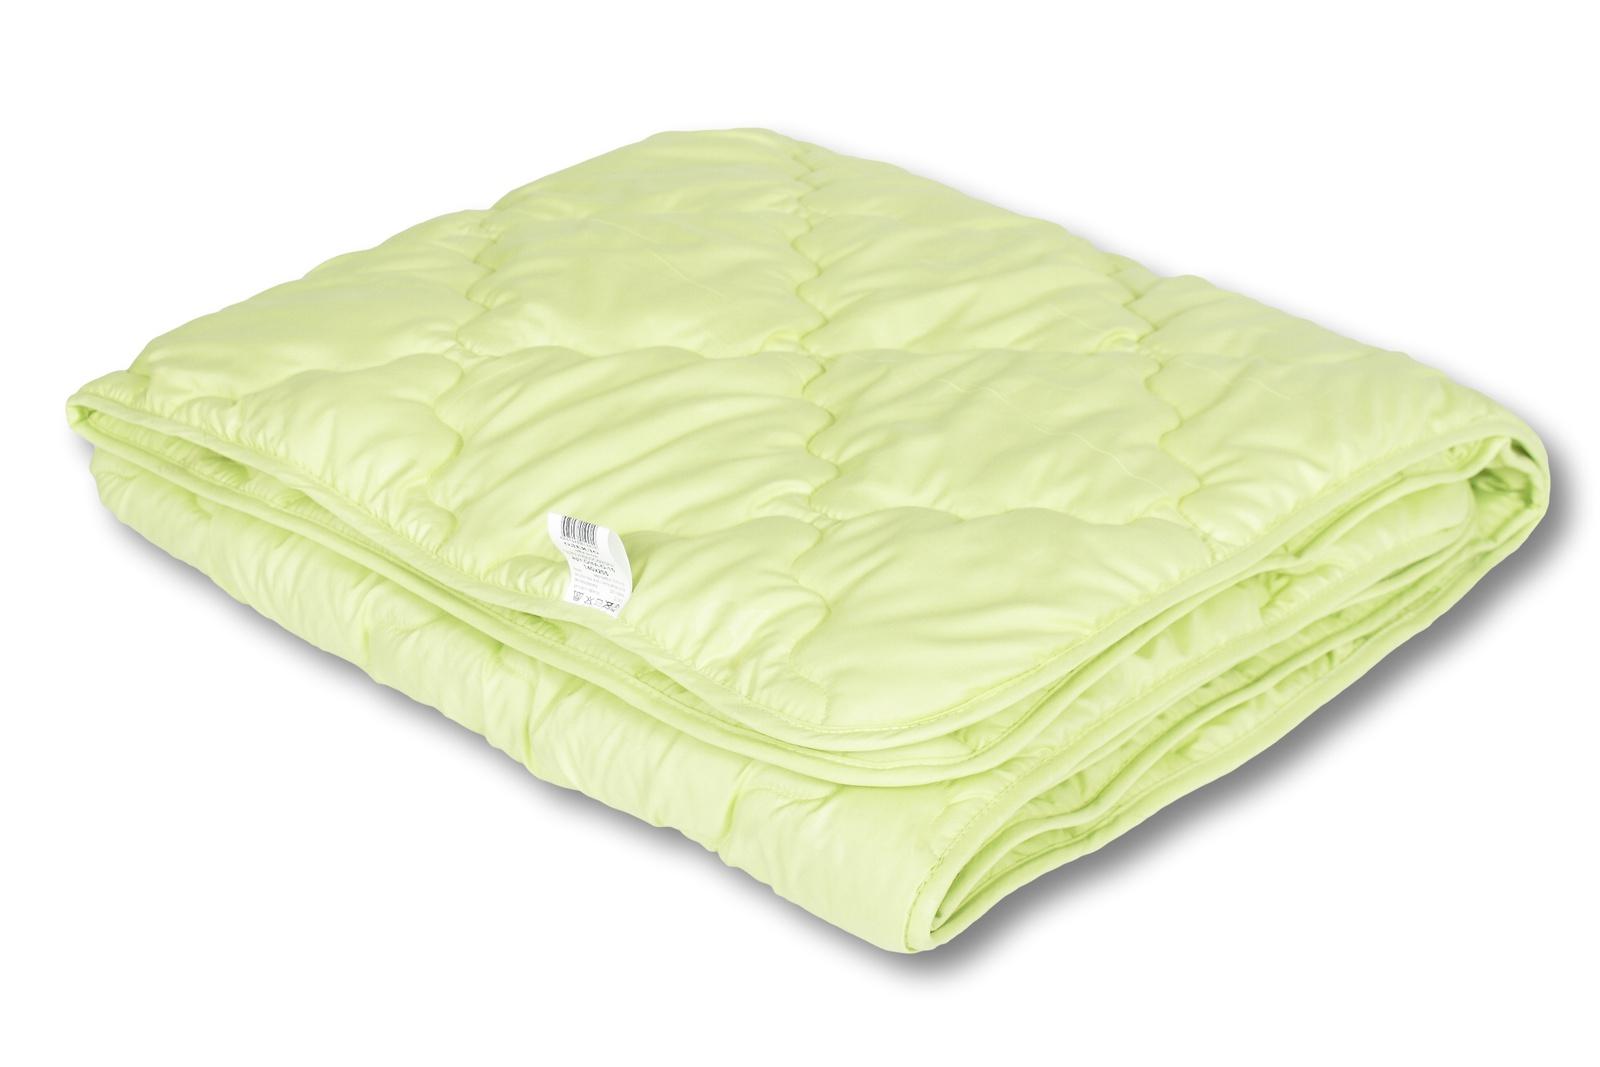 Одеяло Альвитек Алоэ Микрофибра легкое, размер: 140х205 plitex aloe vera soft